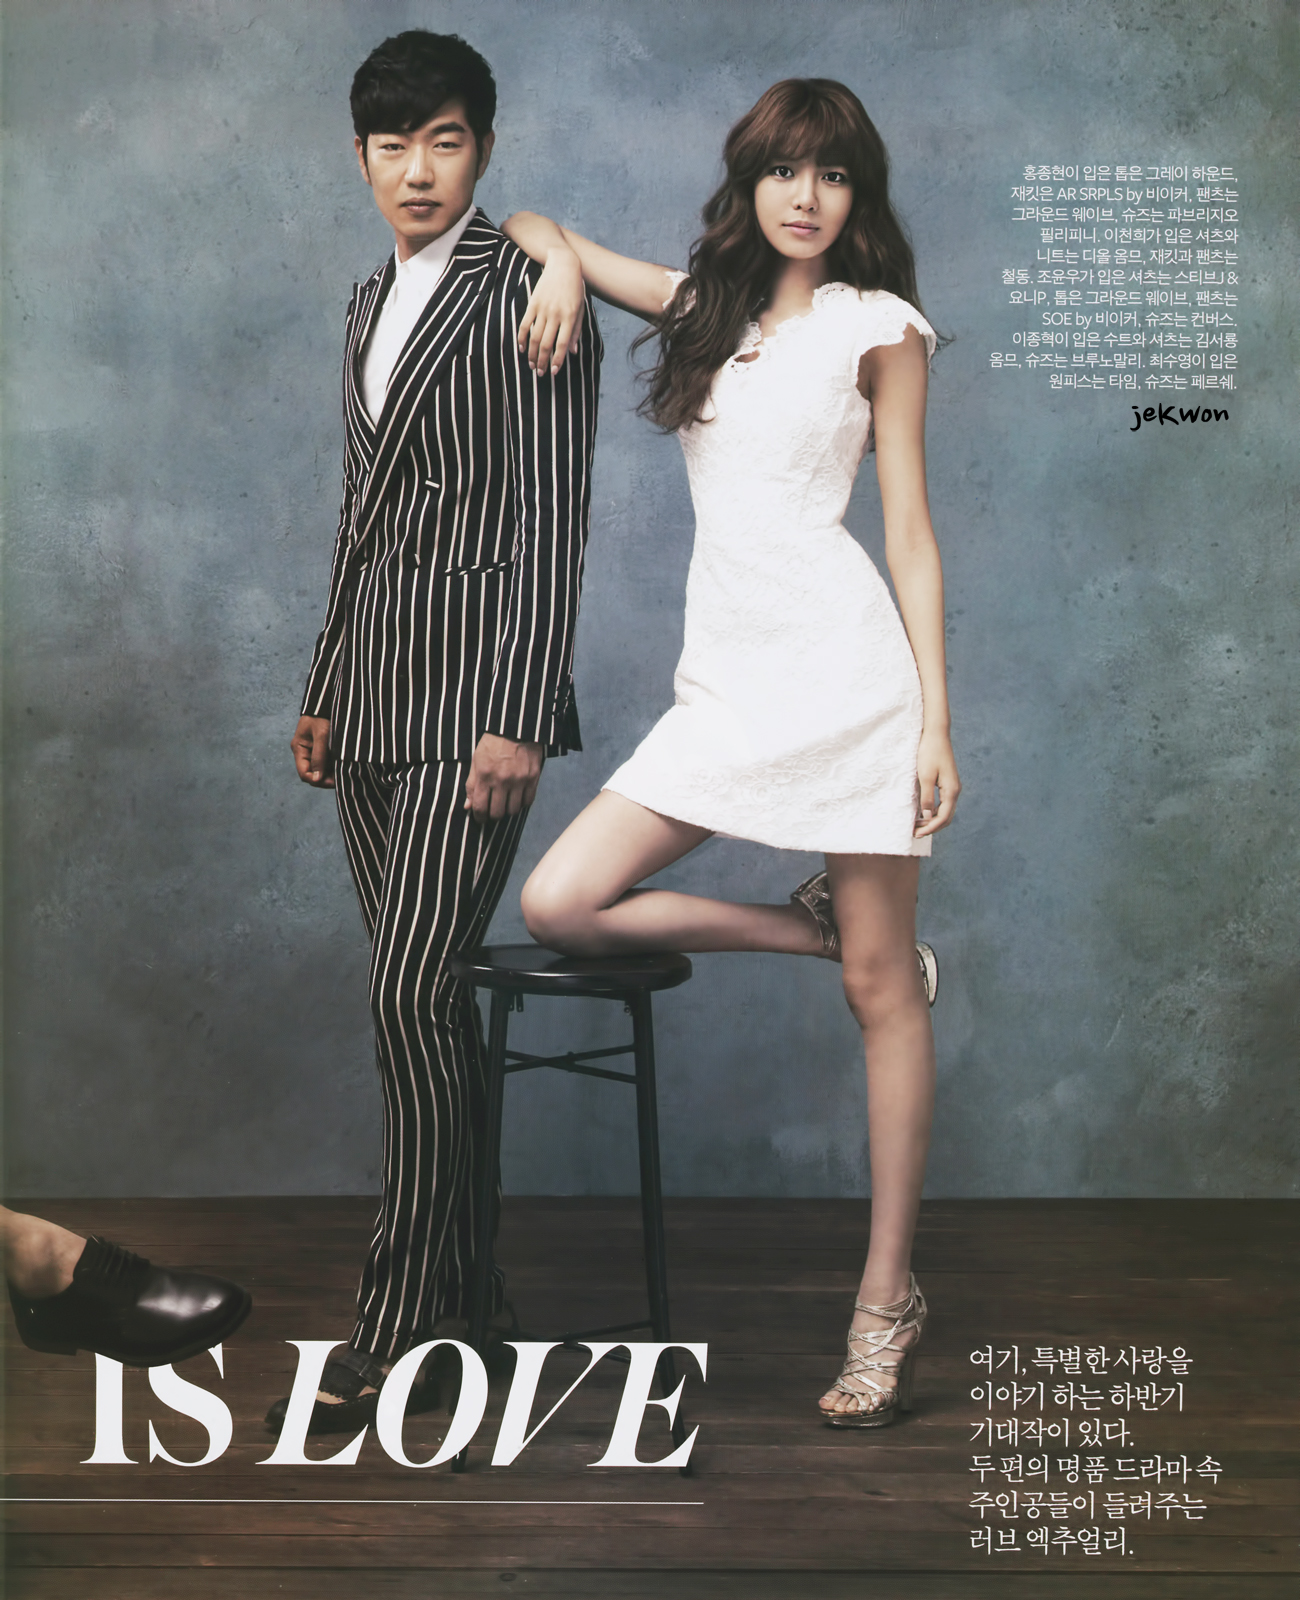 sooyoung cyrano 1